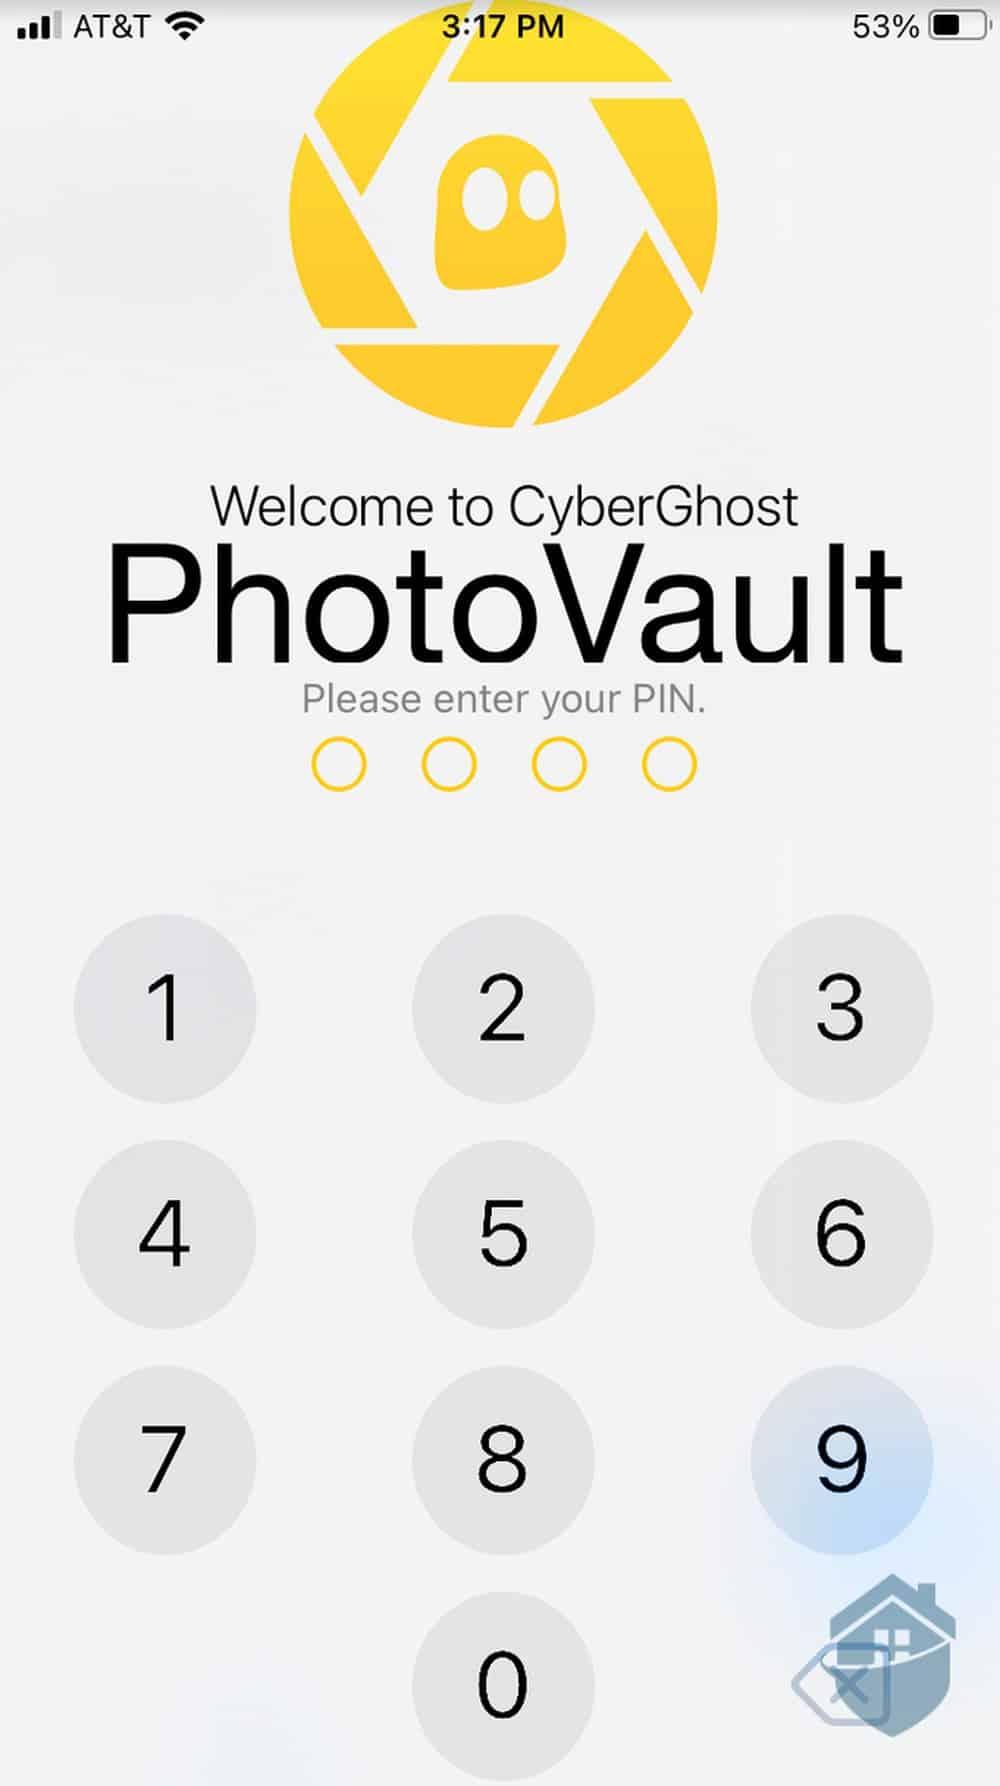 CyberGhost PhotoVault